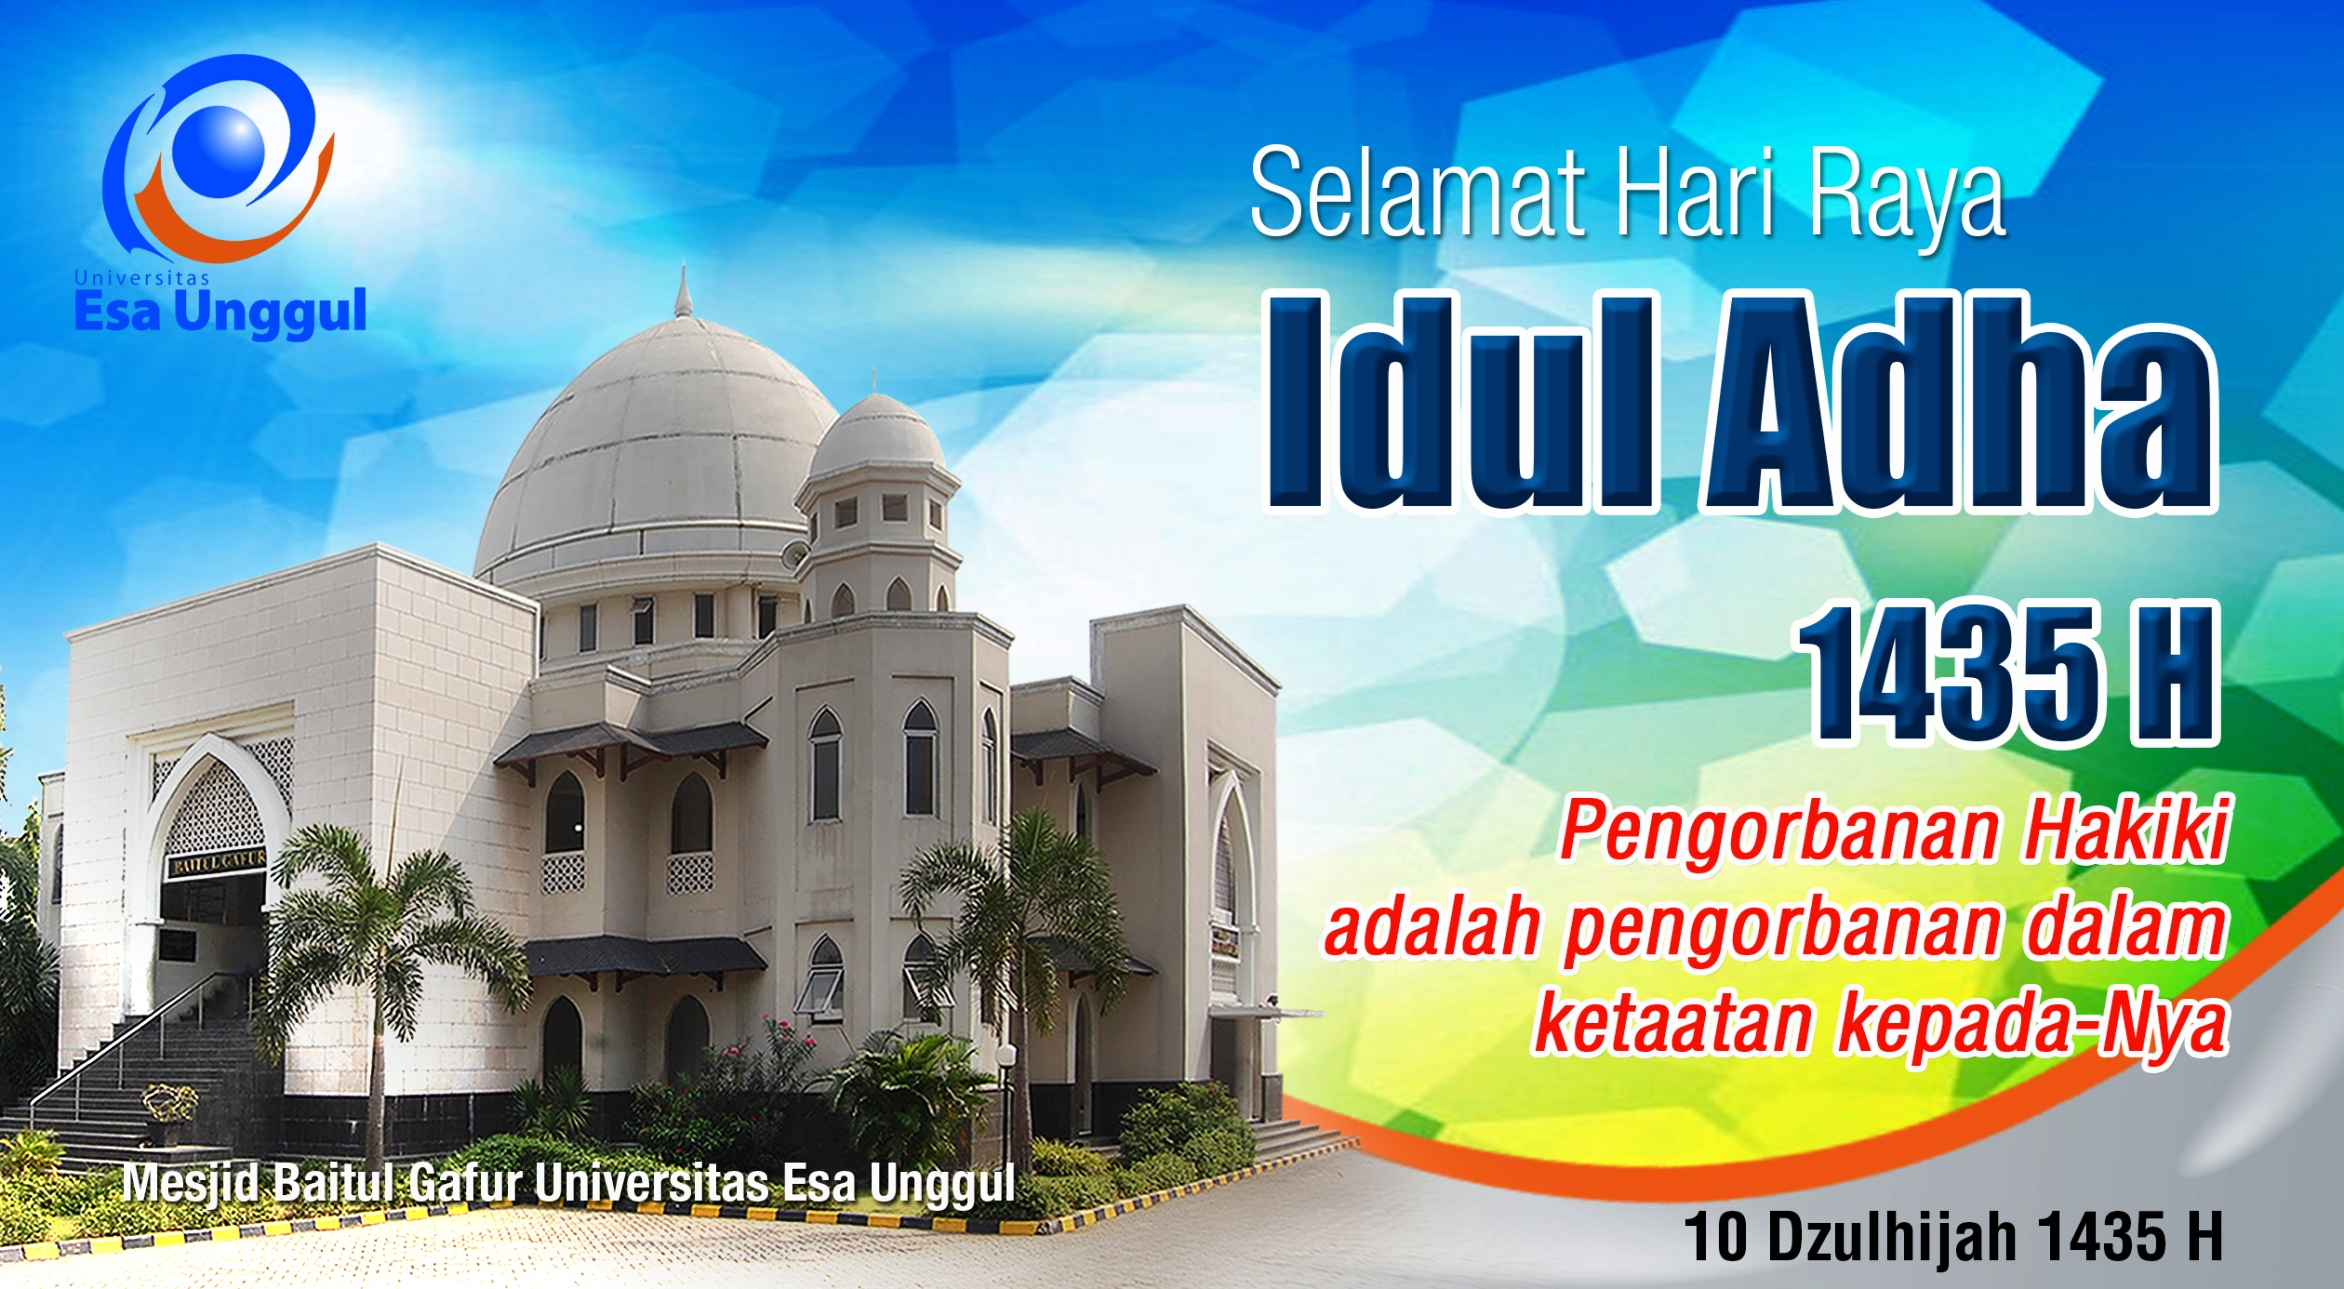 Universitas Esa Unggul mengucapkan Selamat Hari Raya Idul Adha 1435 H